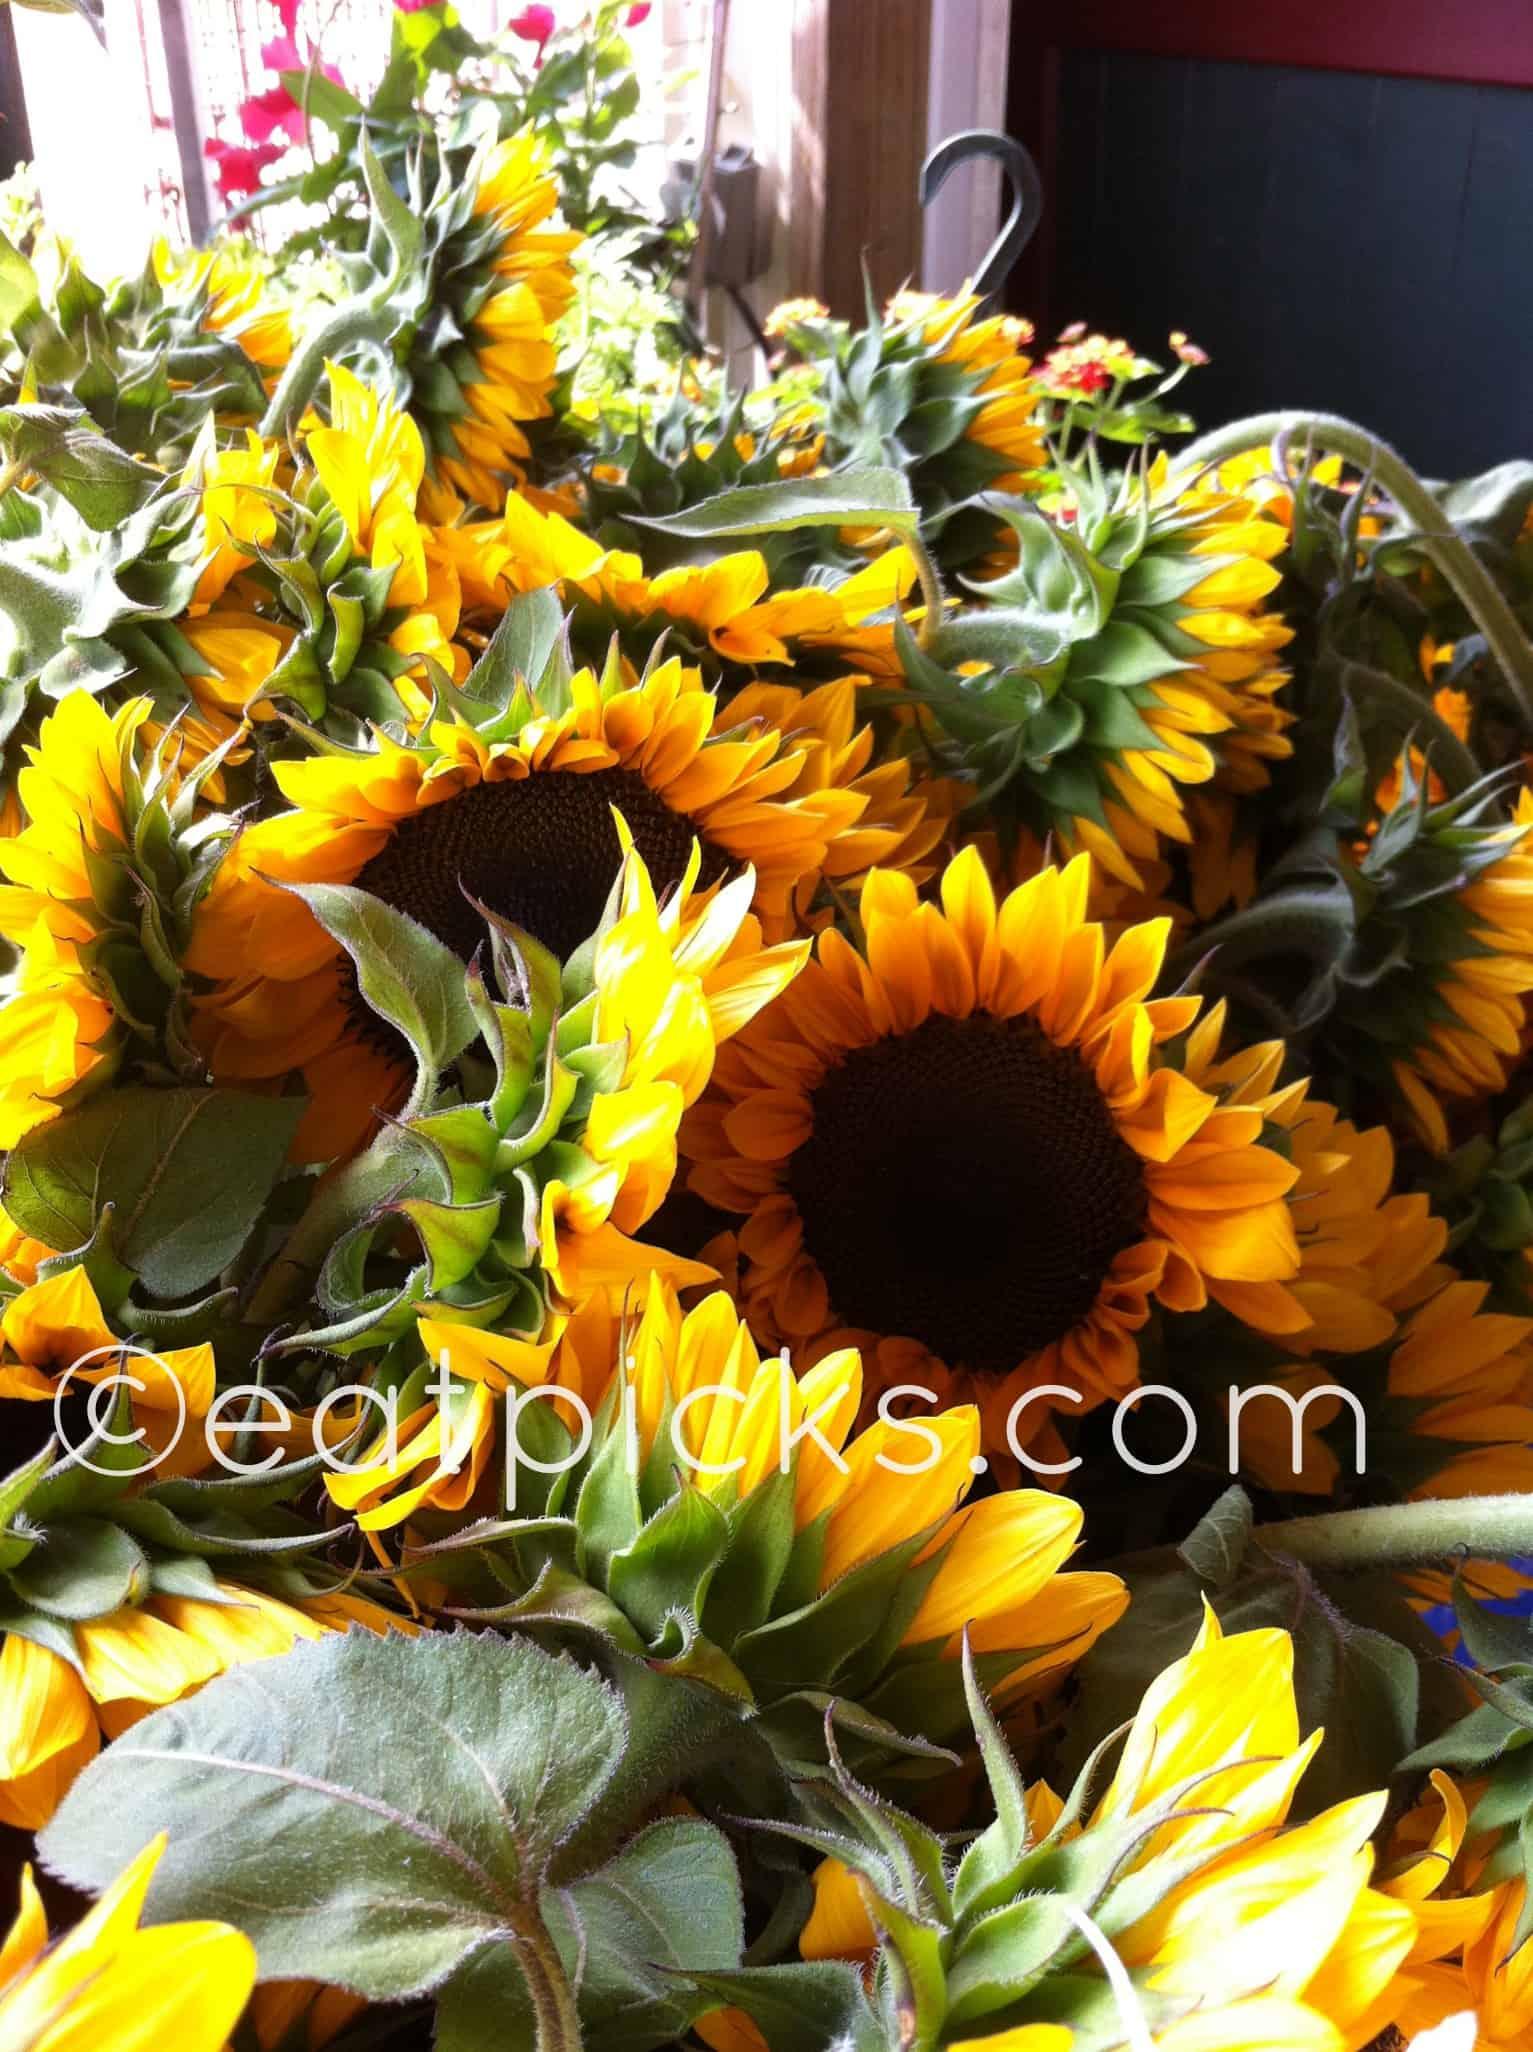 VaBeach6-sunflowers-baybreezefarm-eatpicks.com-2012 102